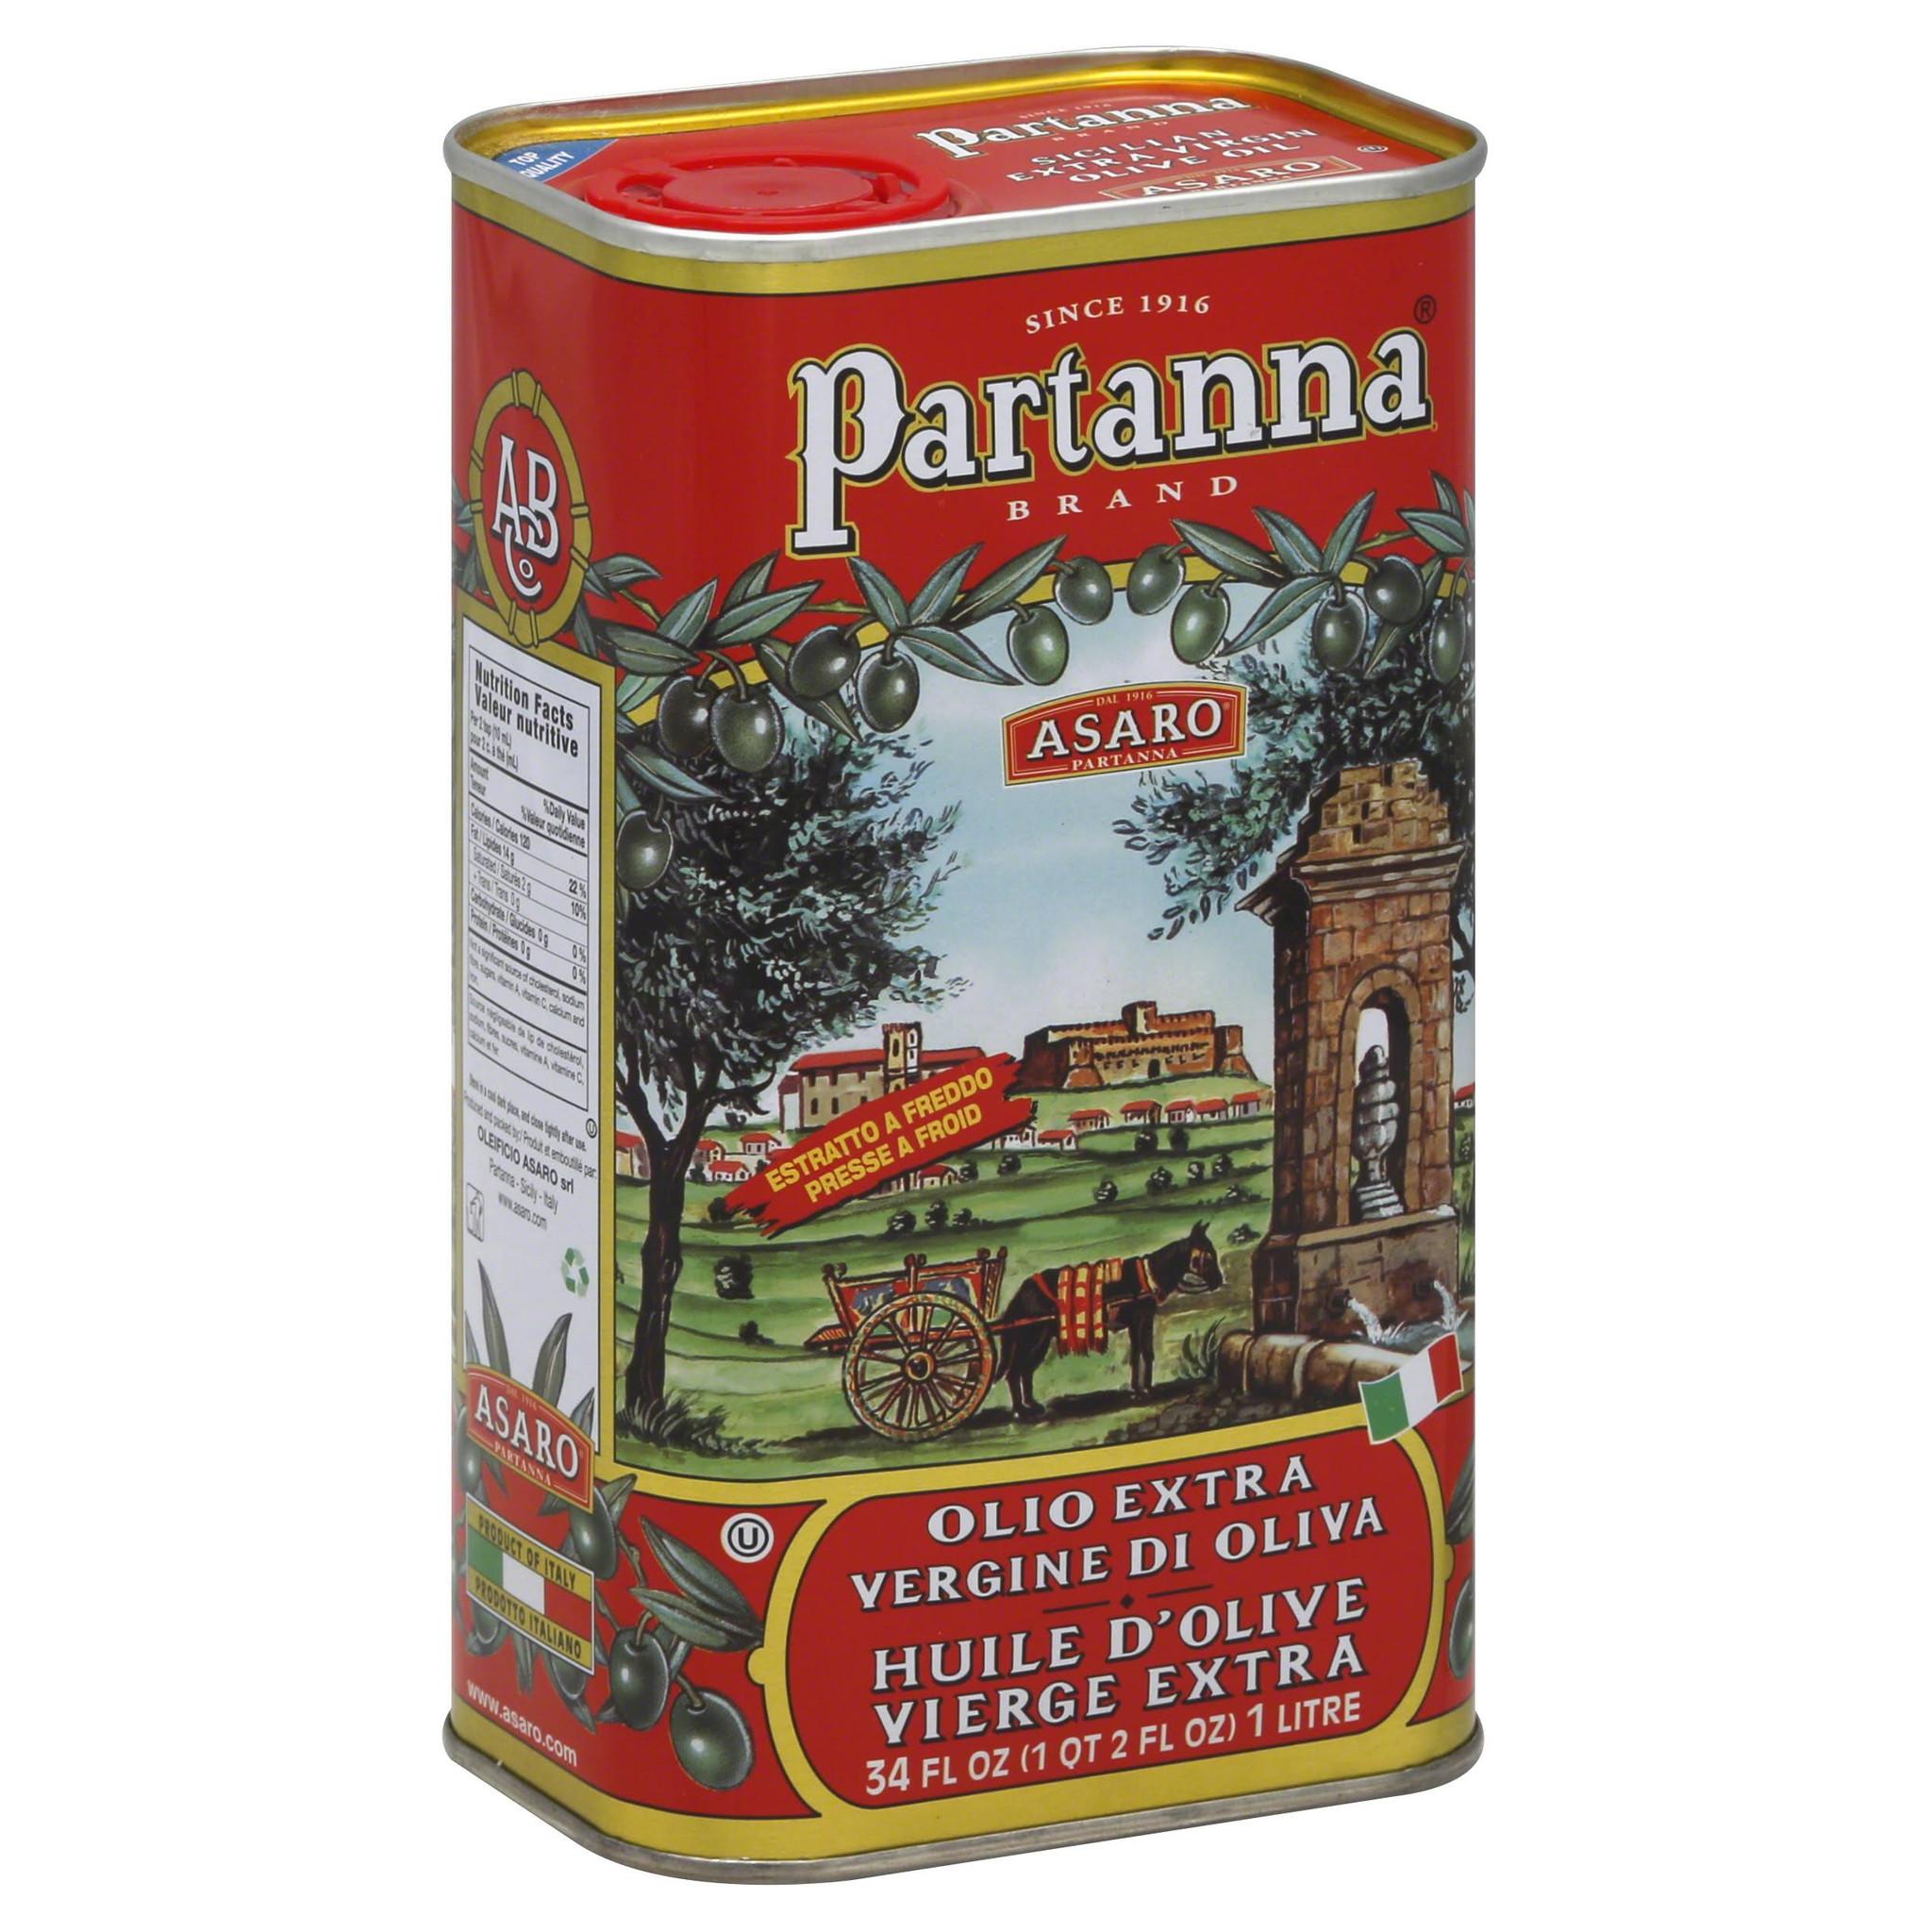 Partanna Extra Virgin Olive Oil, 1L Tin